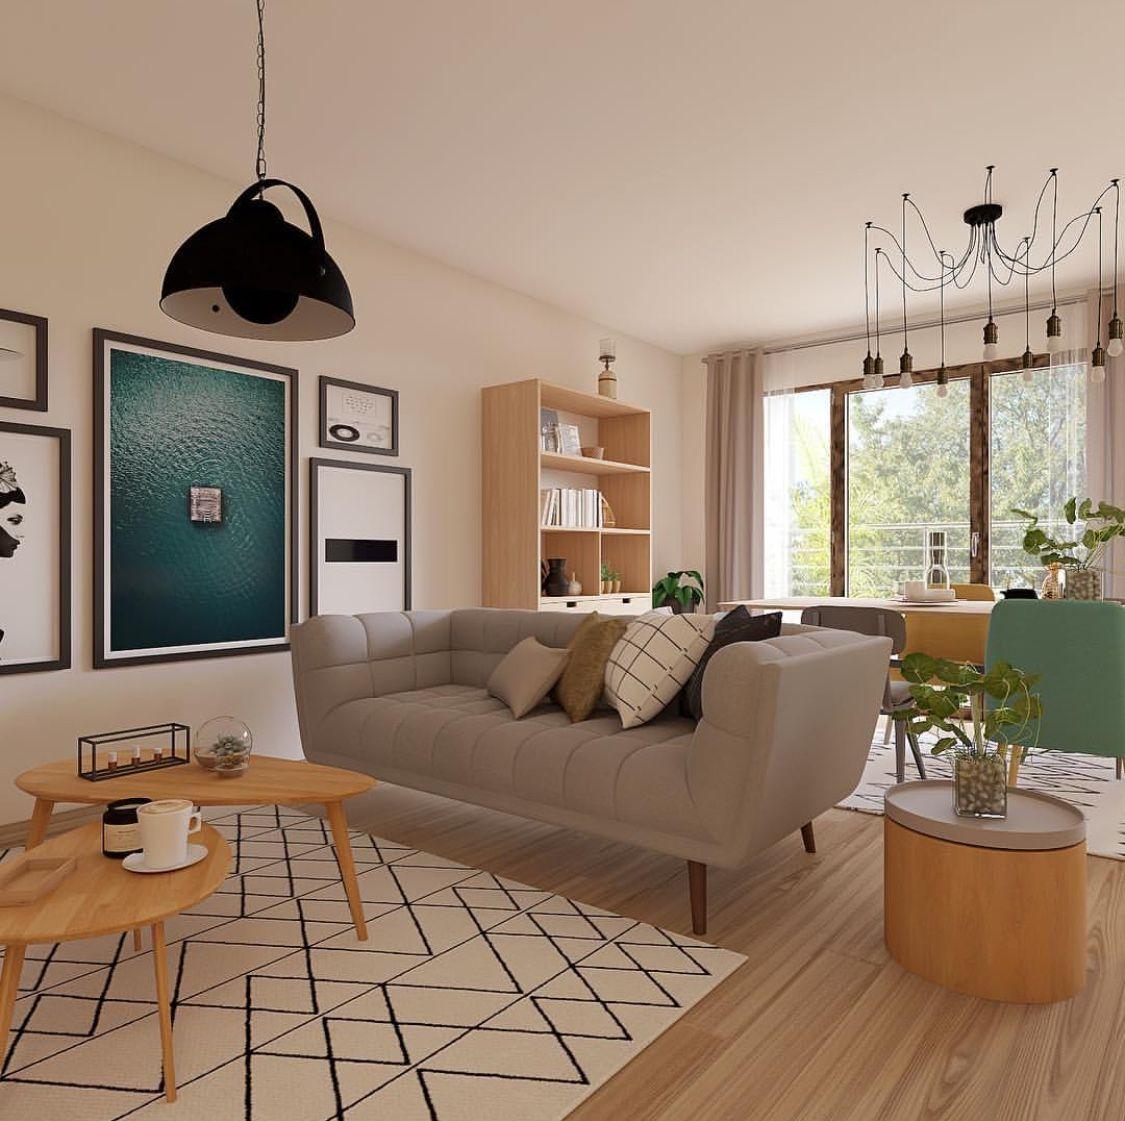 Scandinavian Designinterior Plant: Pin By Natasya On Scandinavian , Simple And Small Space